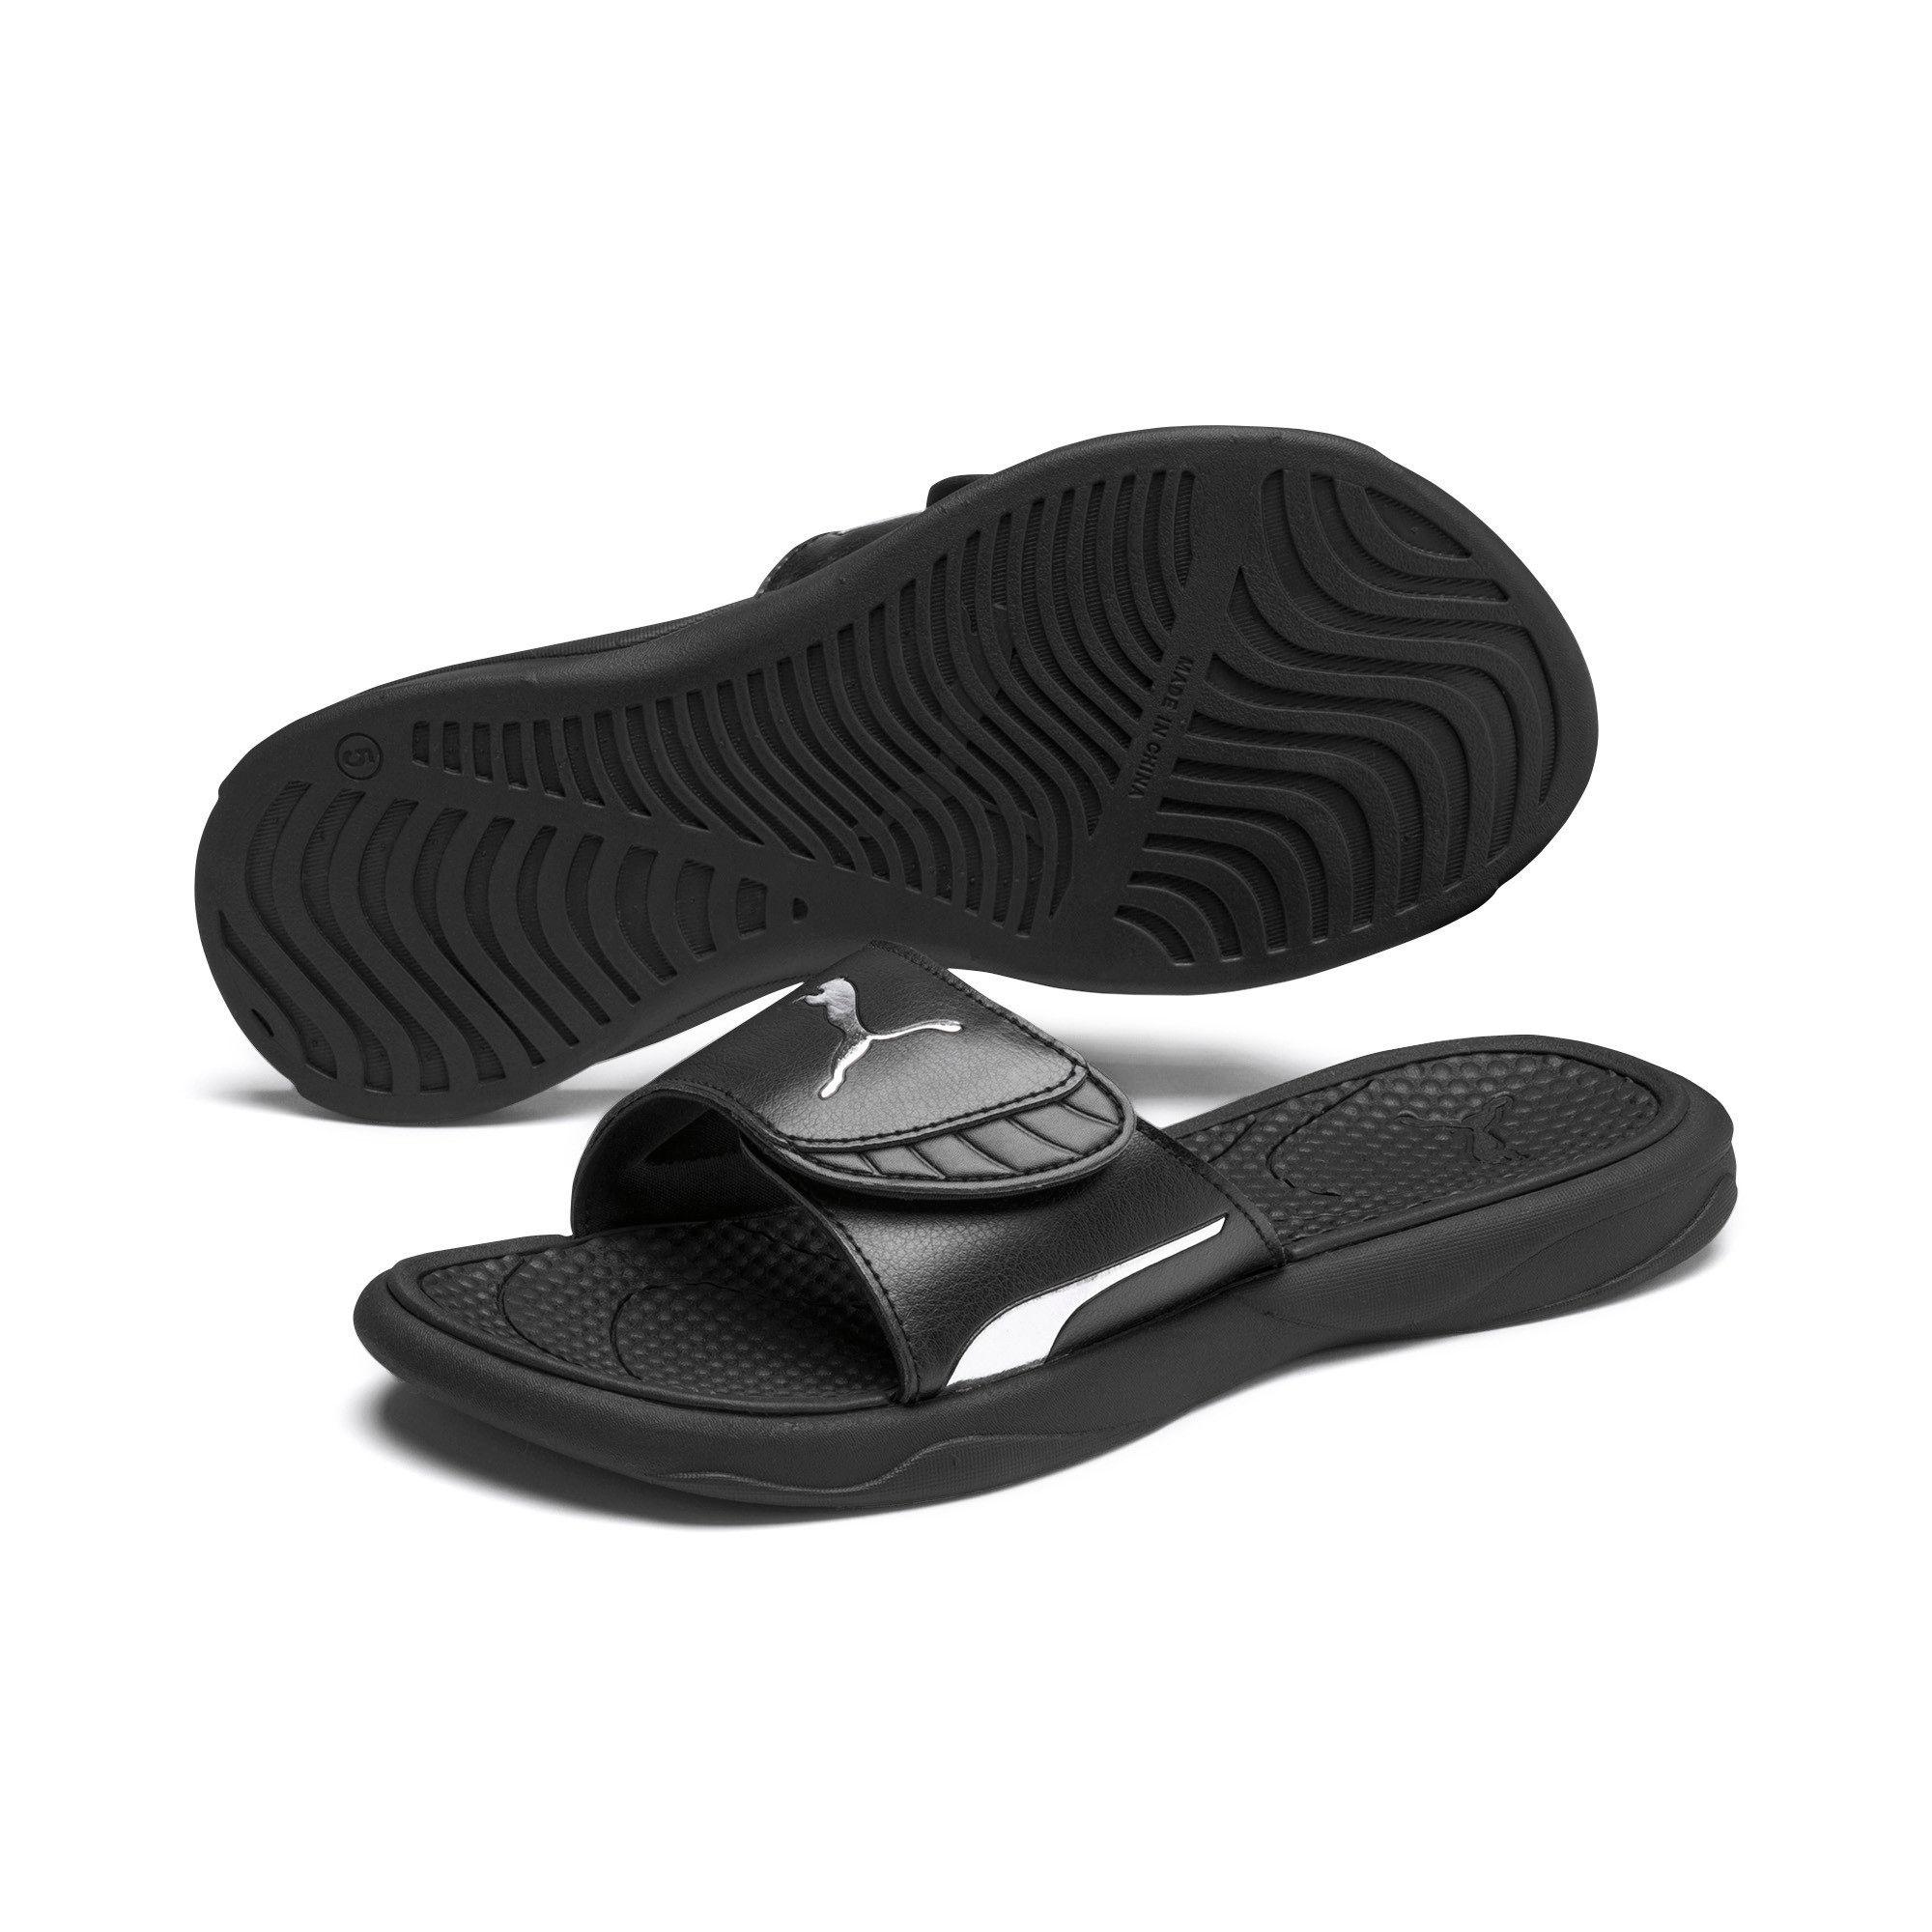 Puma Royalcat Comfort Women's Sandals